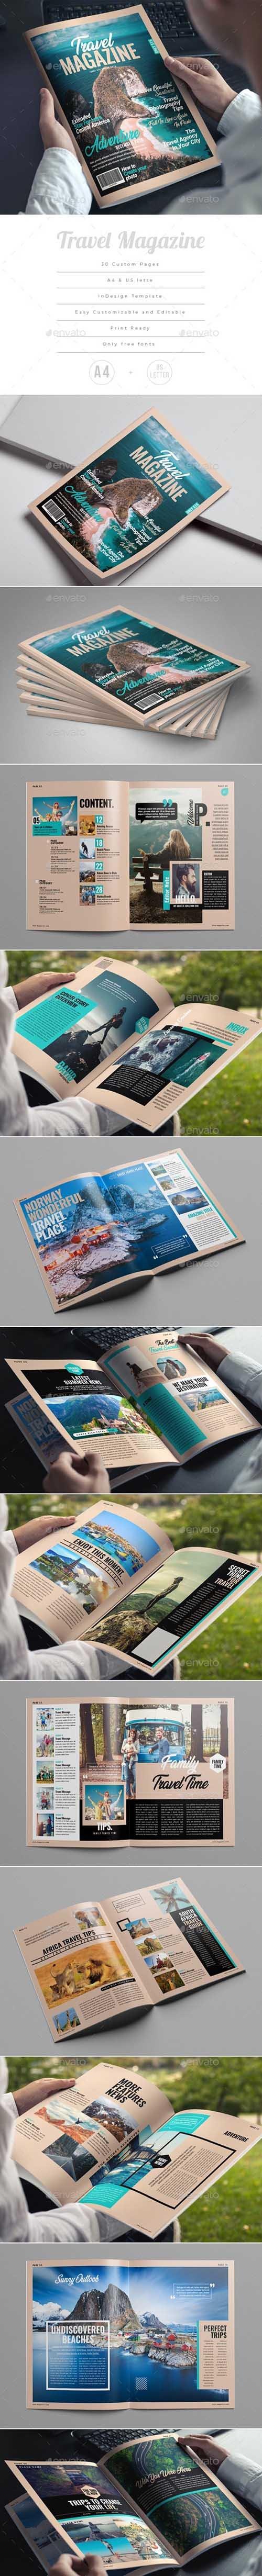 Travel Magazine 25400428